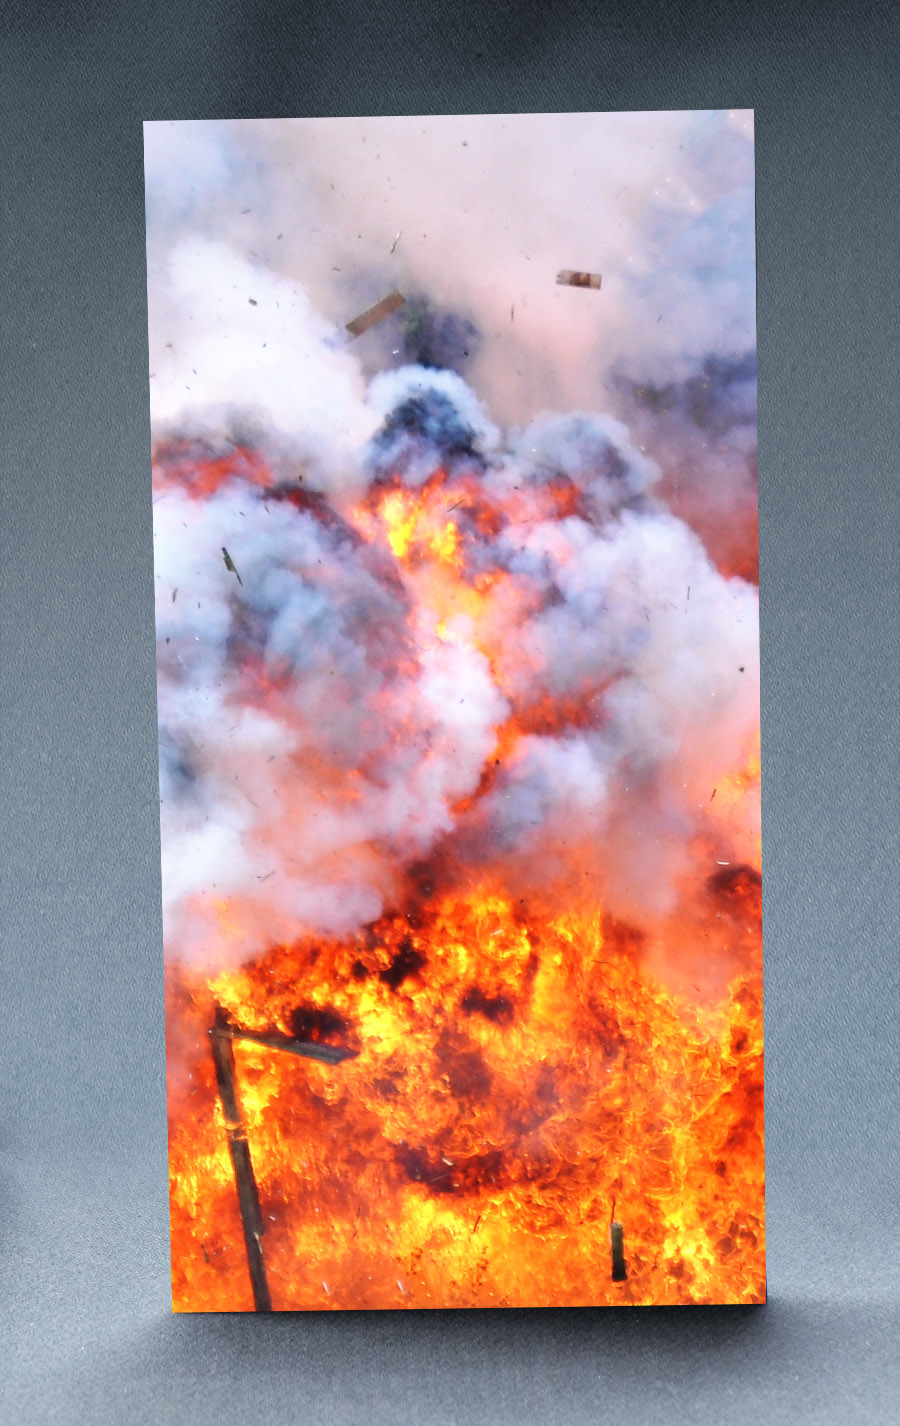 Large Explosion 1:6 Scale Striking Backdrop